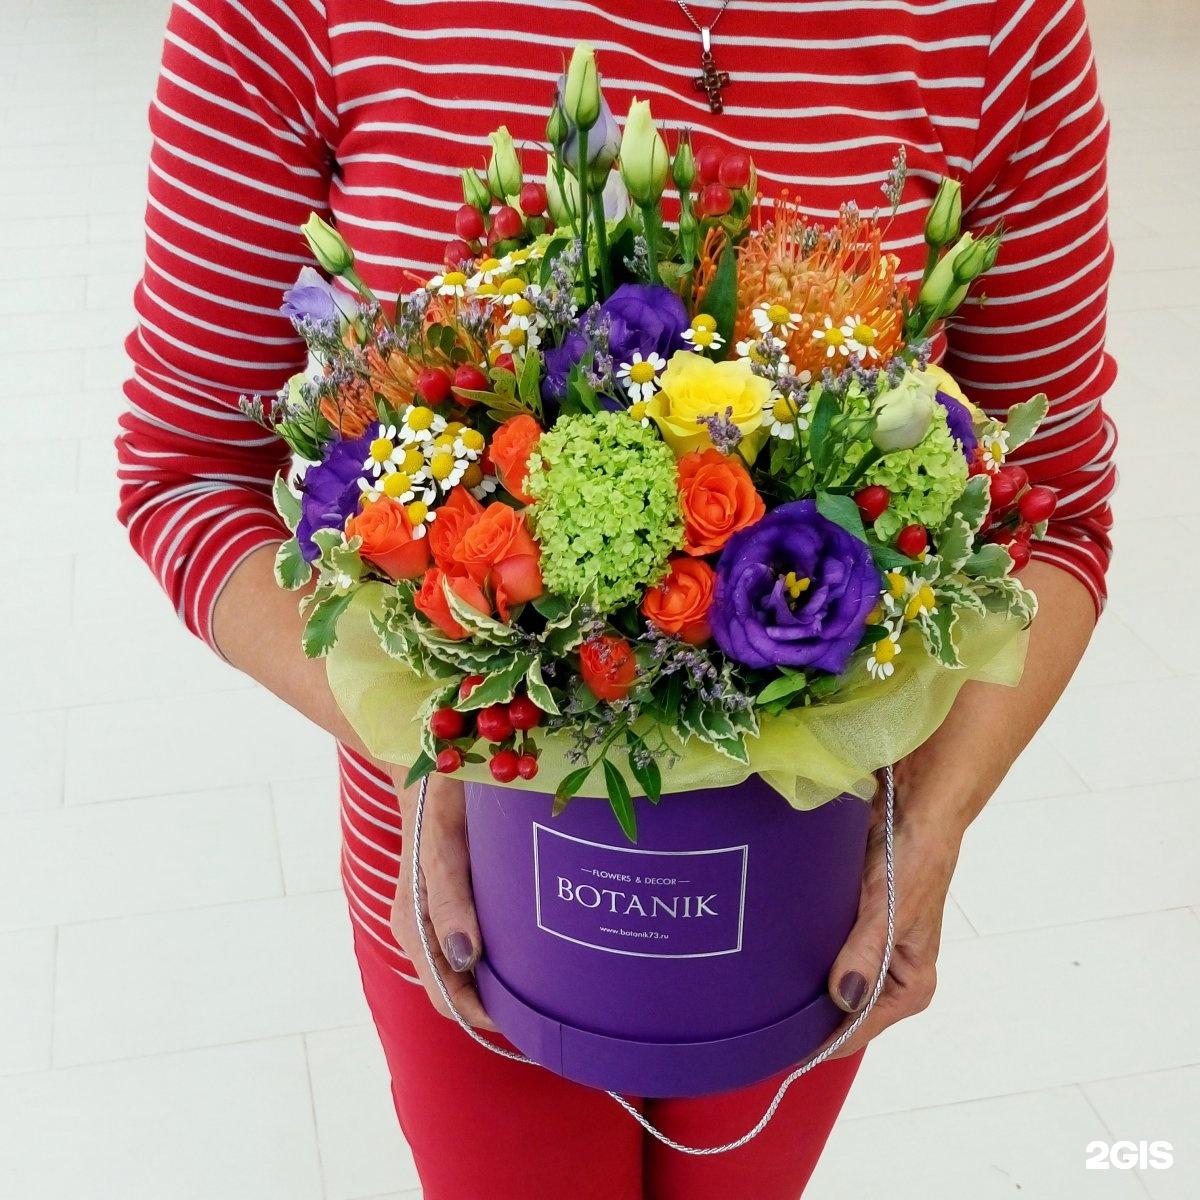 Как подарок, цветок доставка цветов и подарков в сша